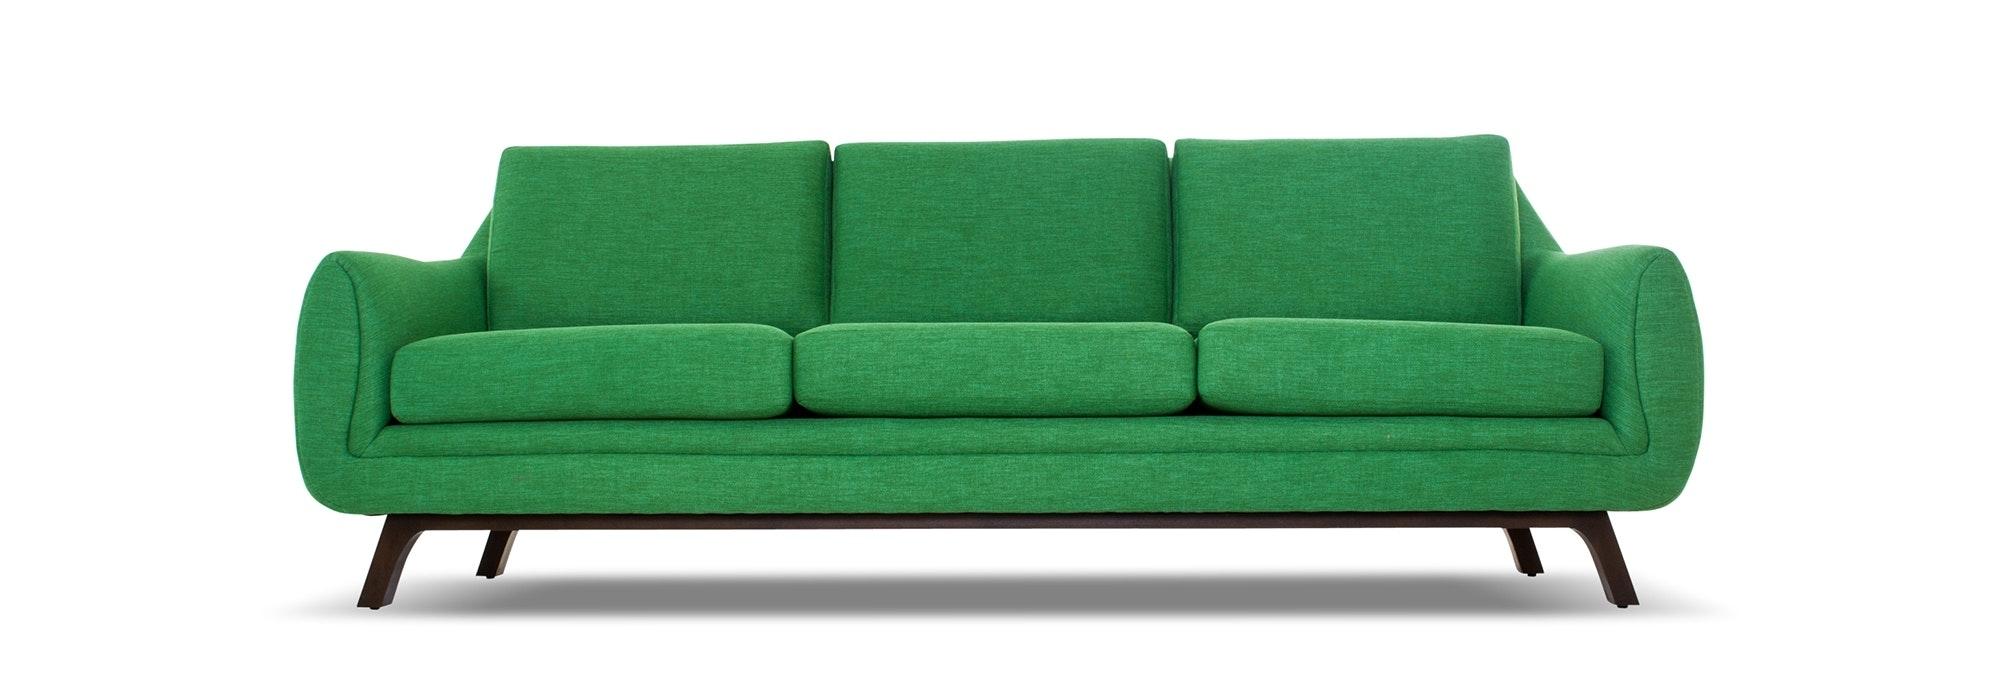 Joybird Within Sectional Sofas At Buffalo Ny (View 9 of 15)